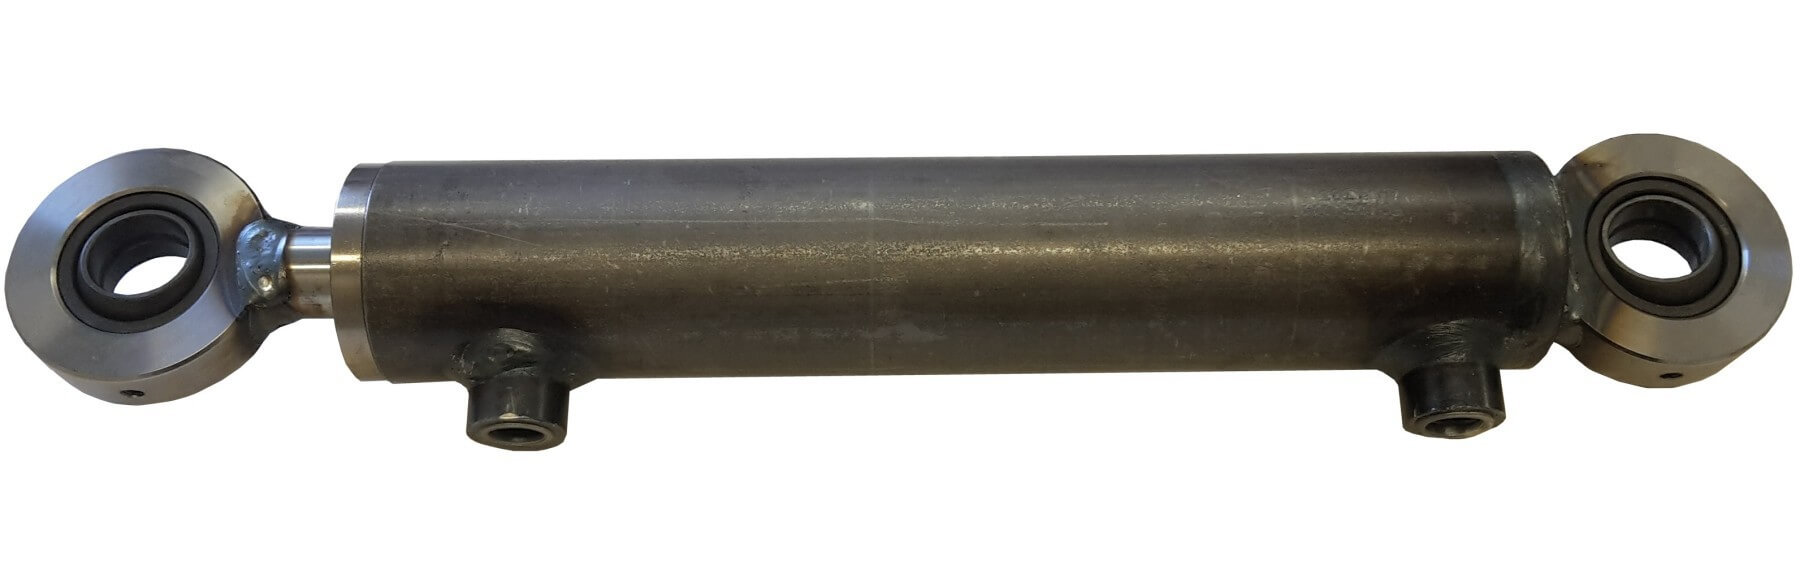 Hydraulisylinteri CL 50. 30. 350 GE